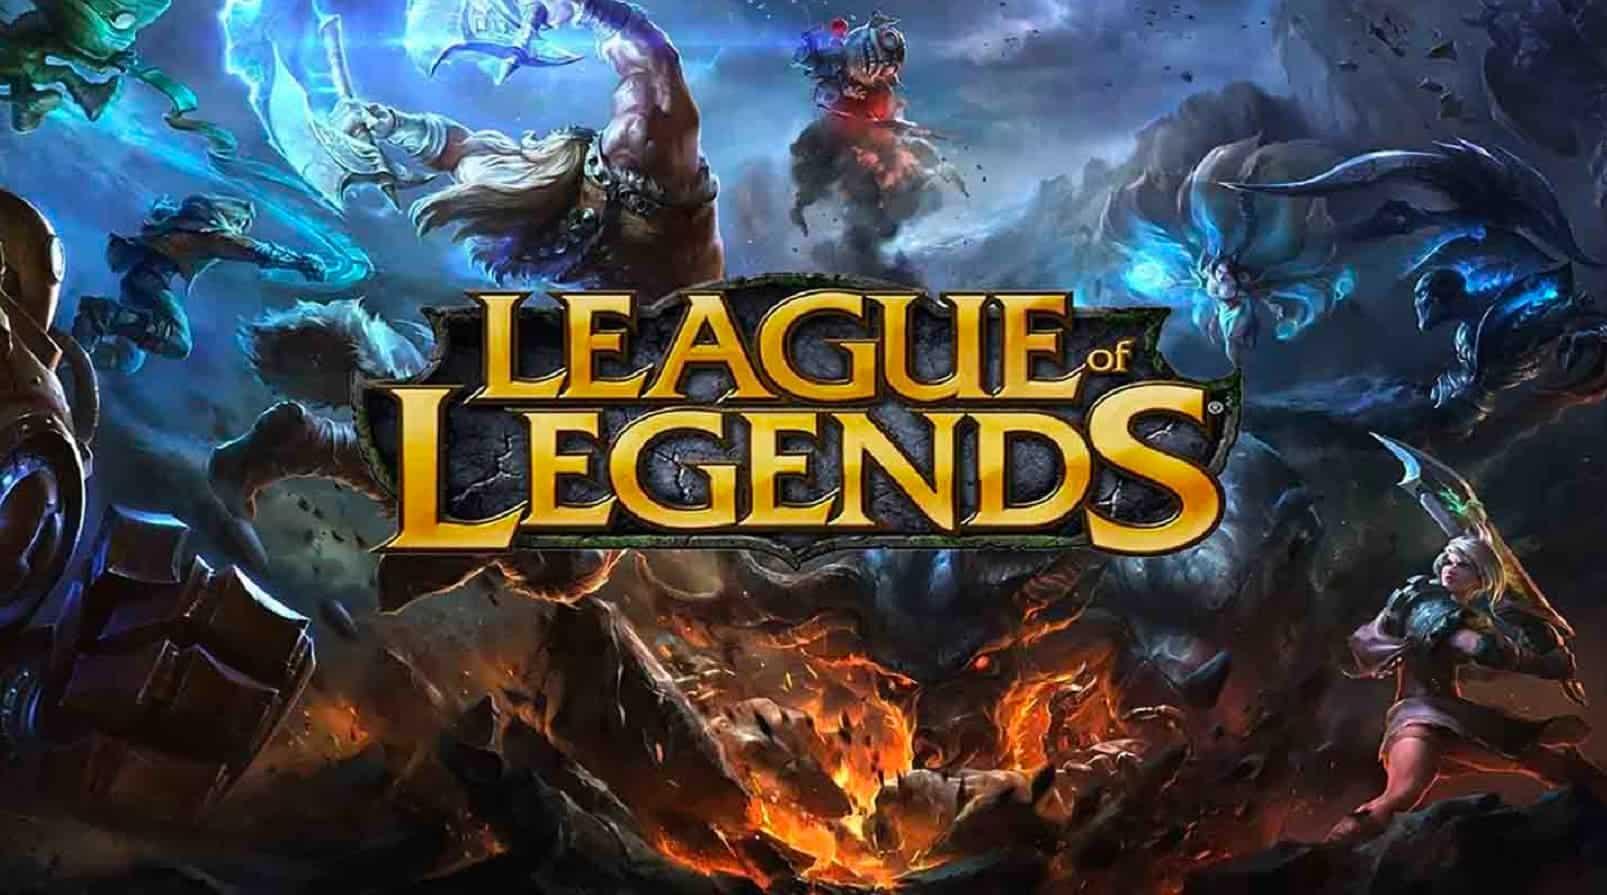 league-of-legends-poster